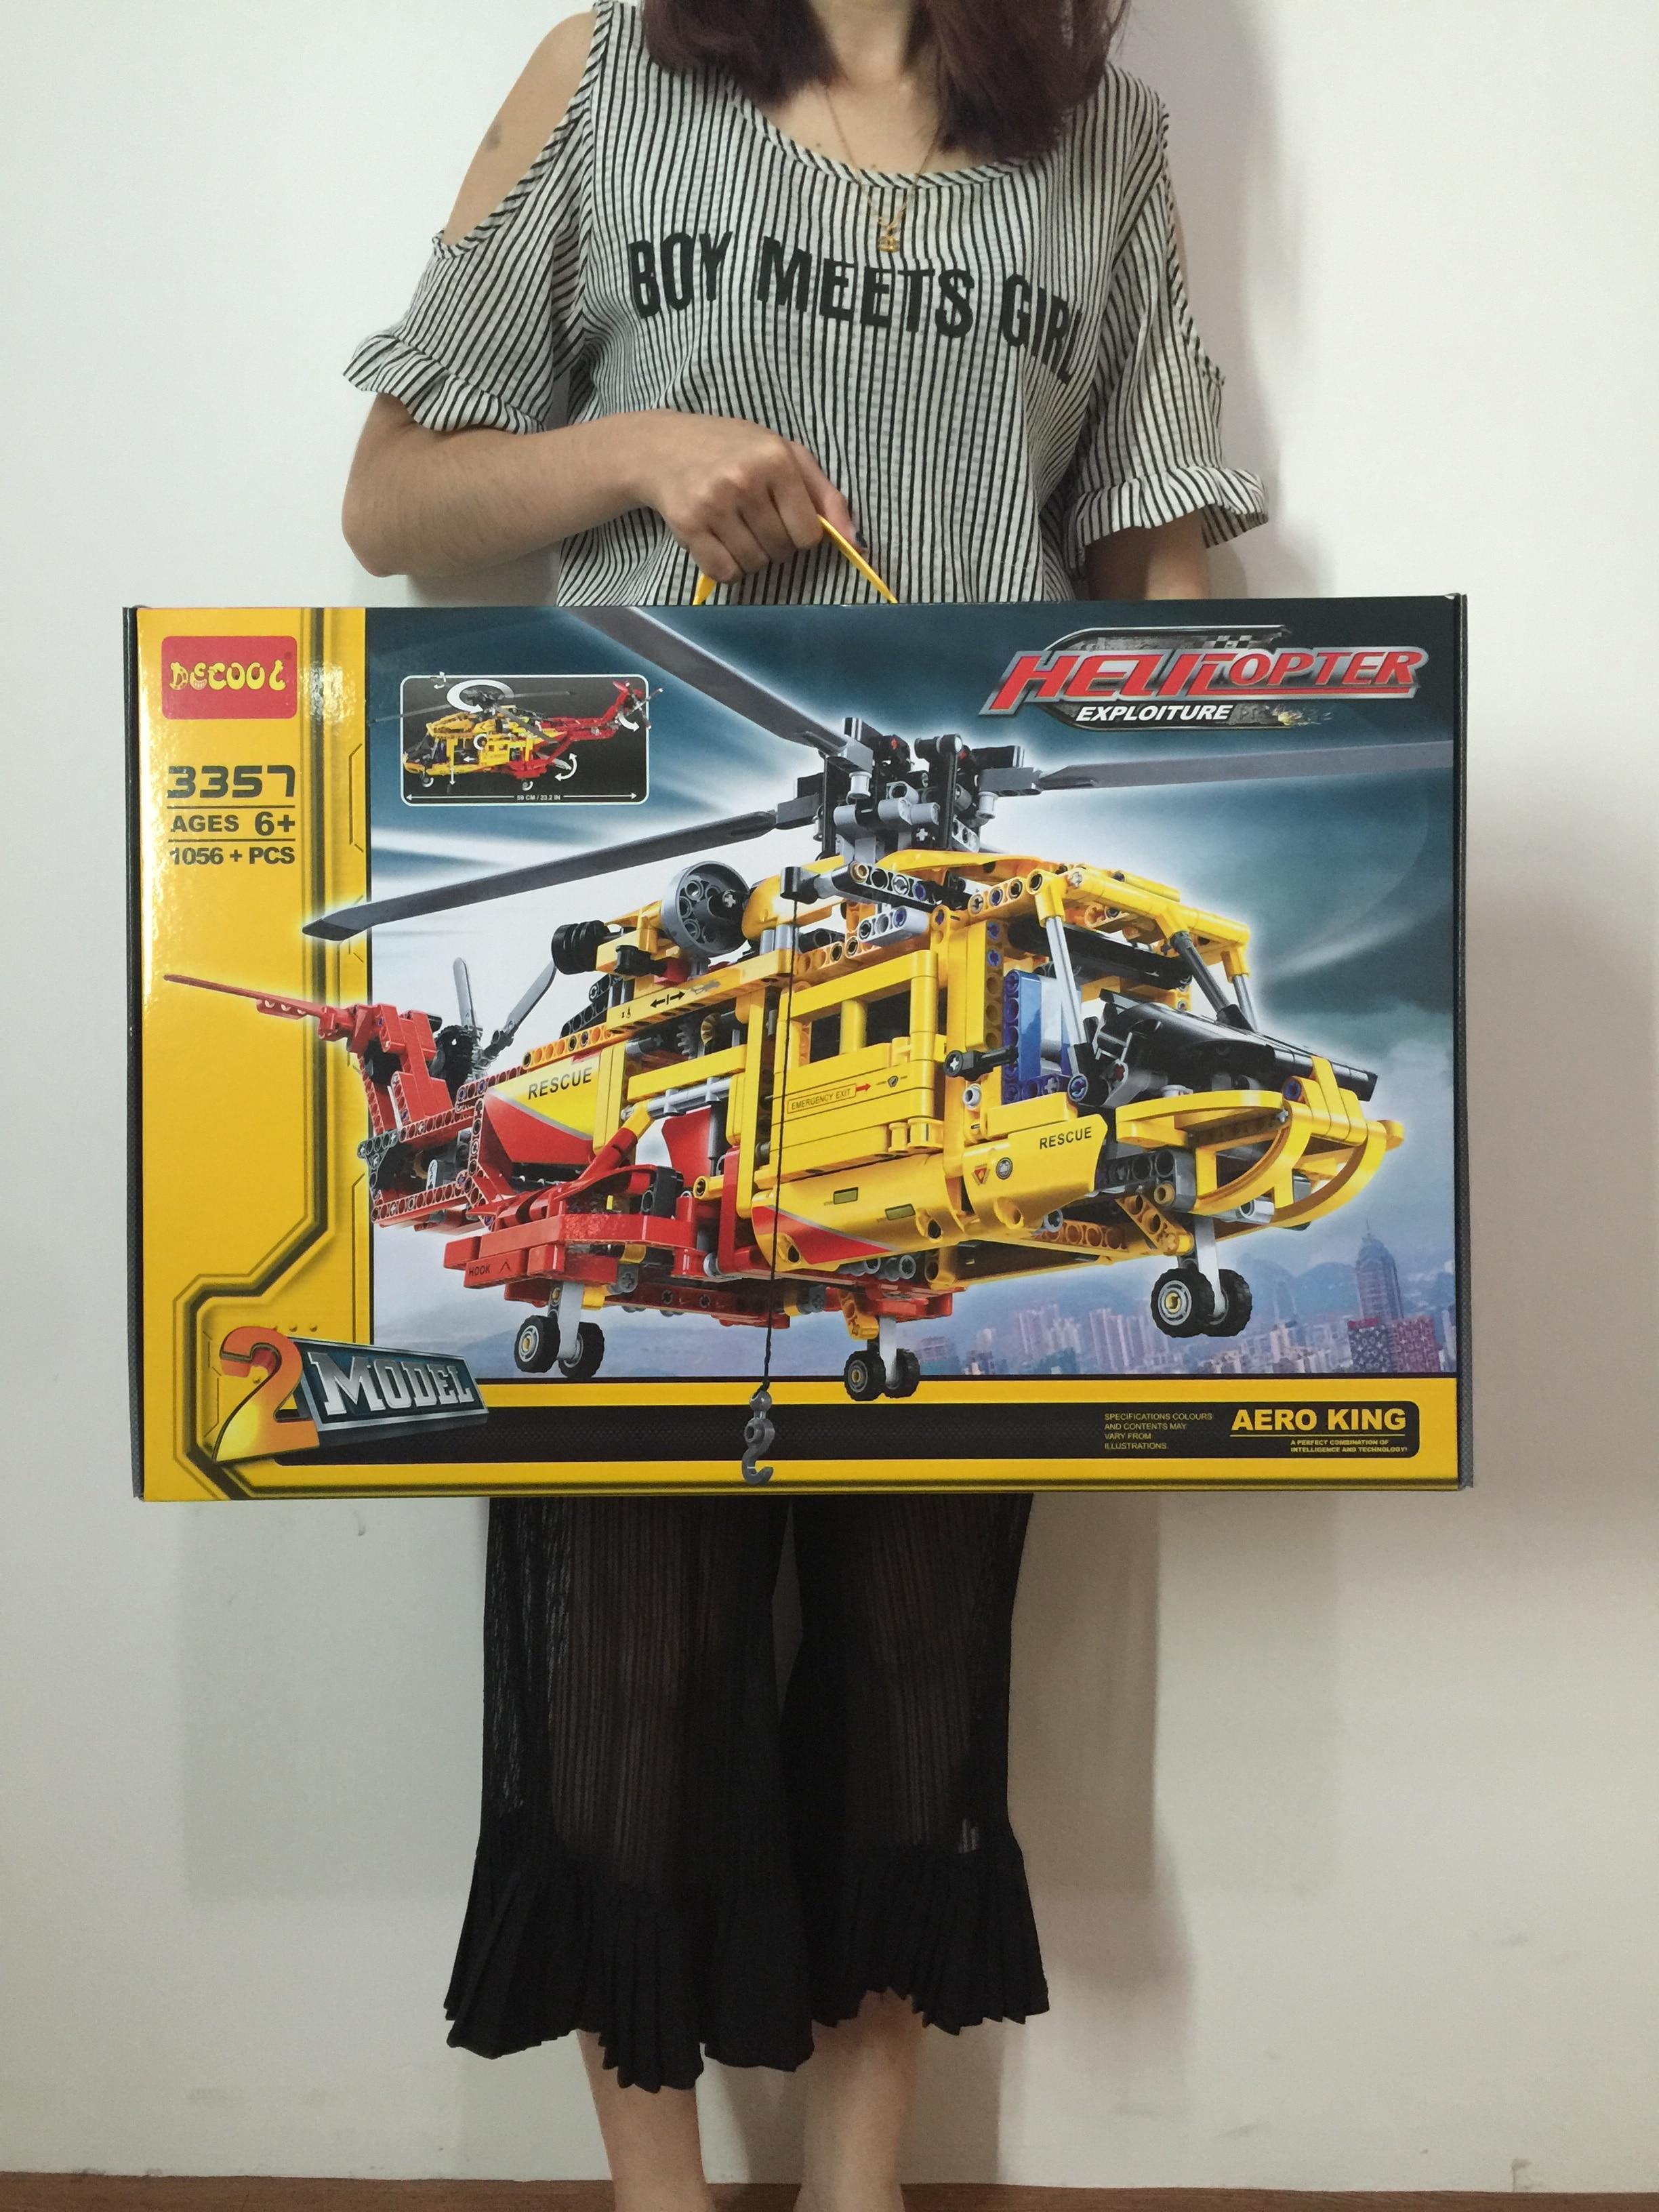 DECOOL TECHNIC 3357 Legolys Technic Military City WW2 Rescue Helicopter Plane Building Blocks Bricks Toys For Children Gift 9396